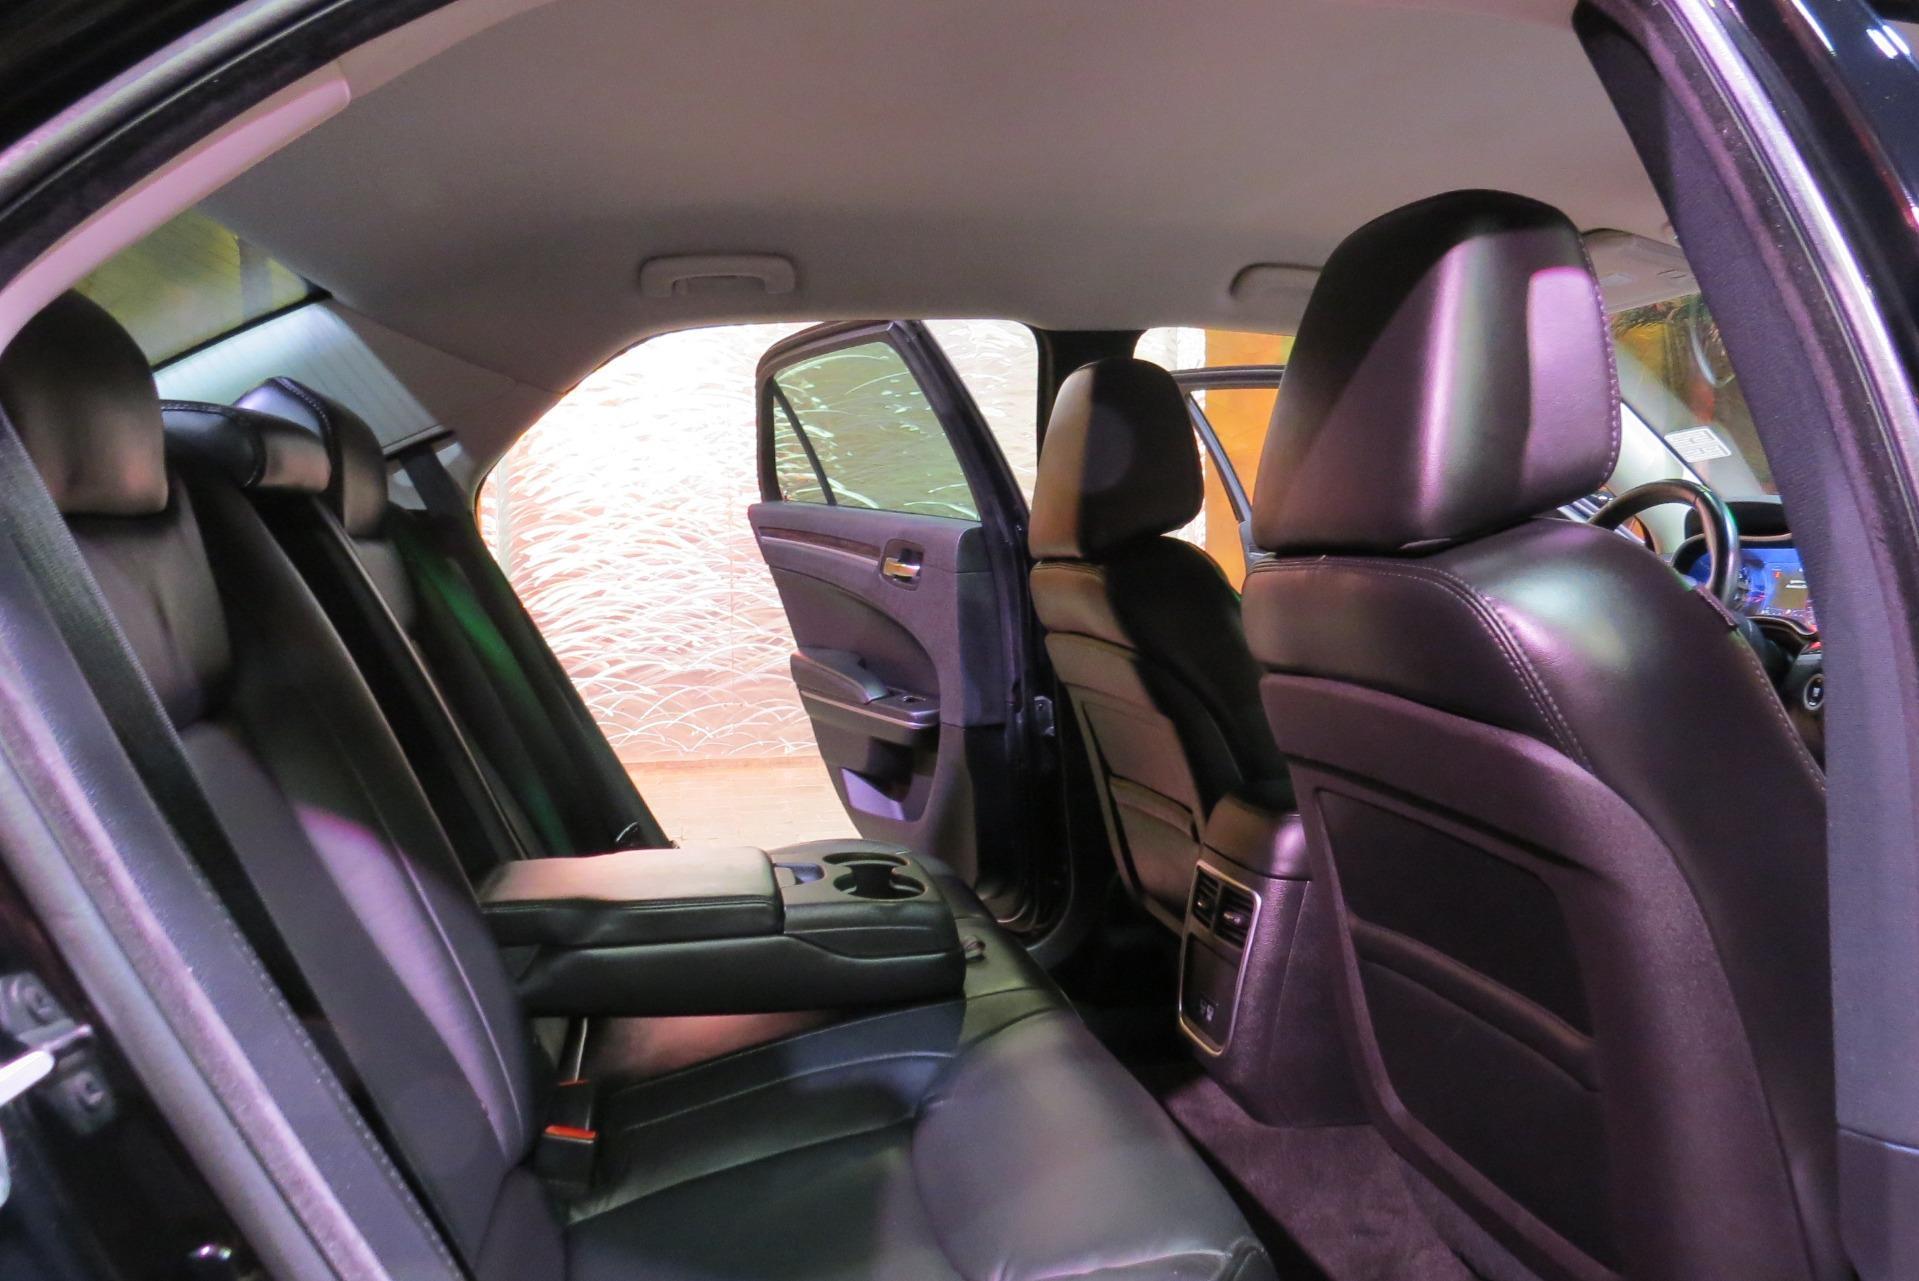 used 2016 Chrysler 300 car, priced at $24,600